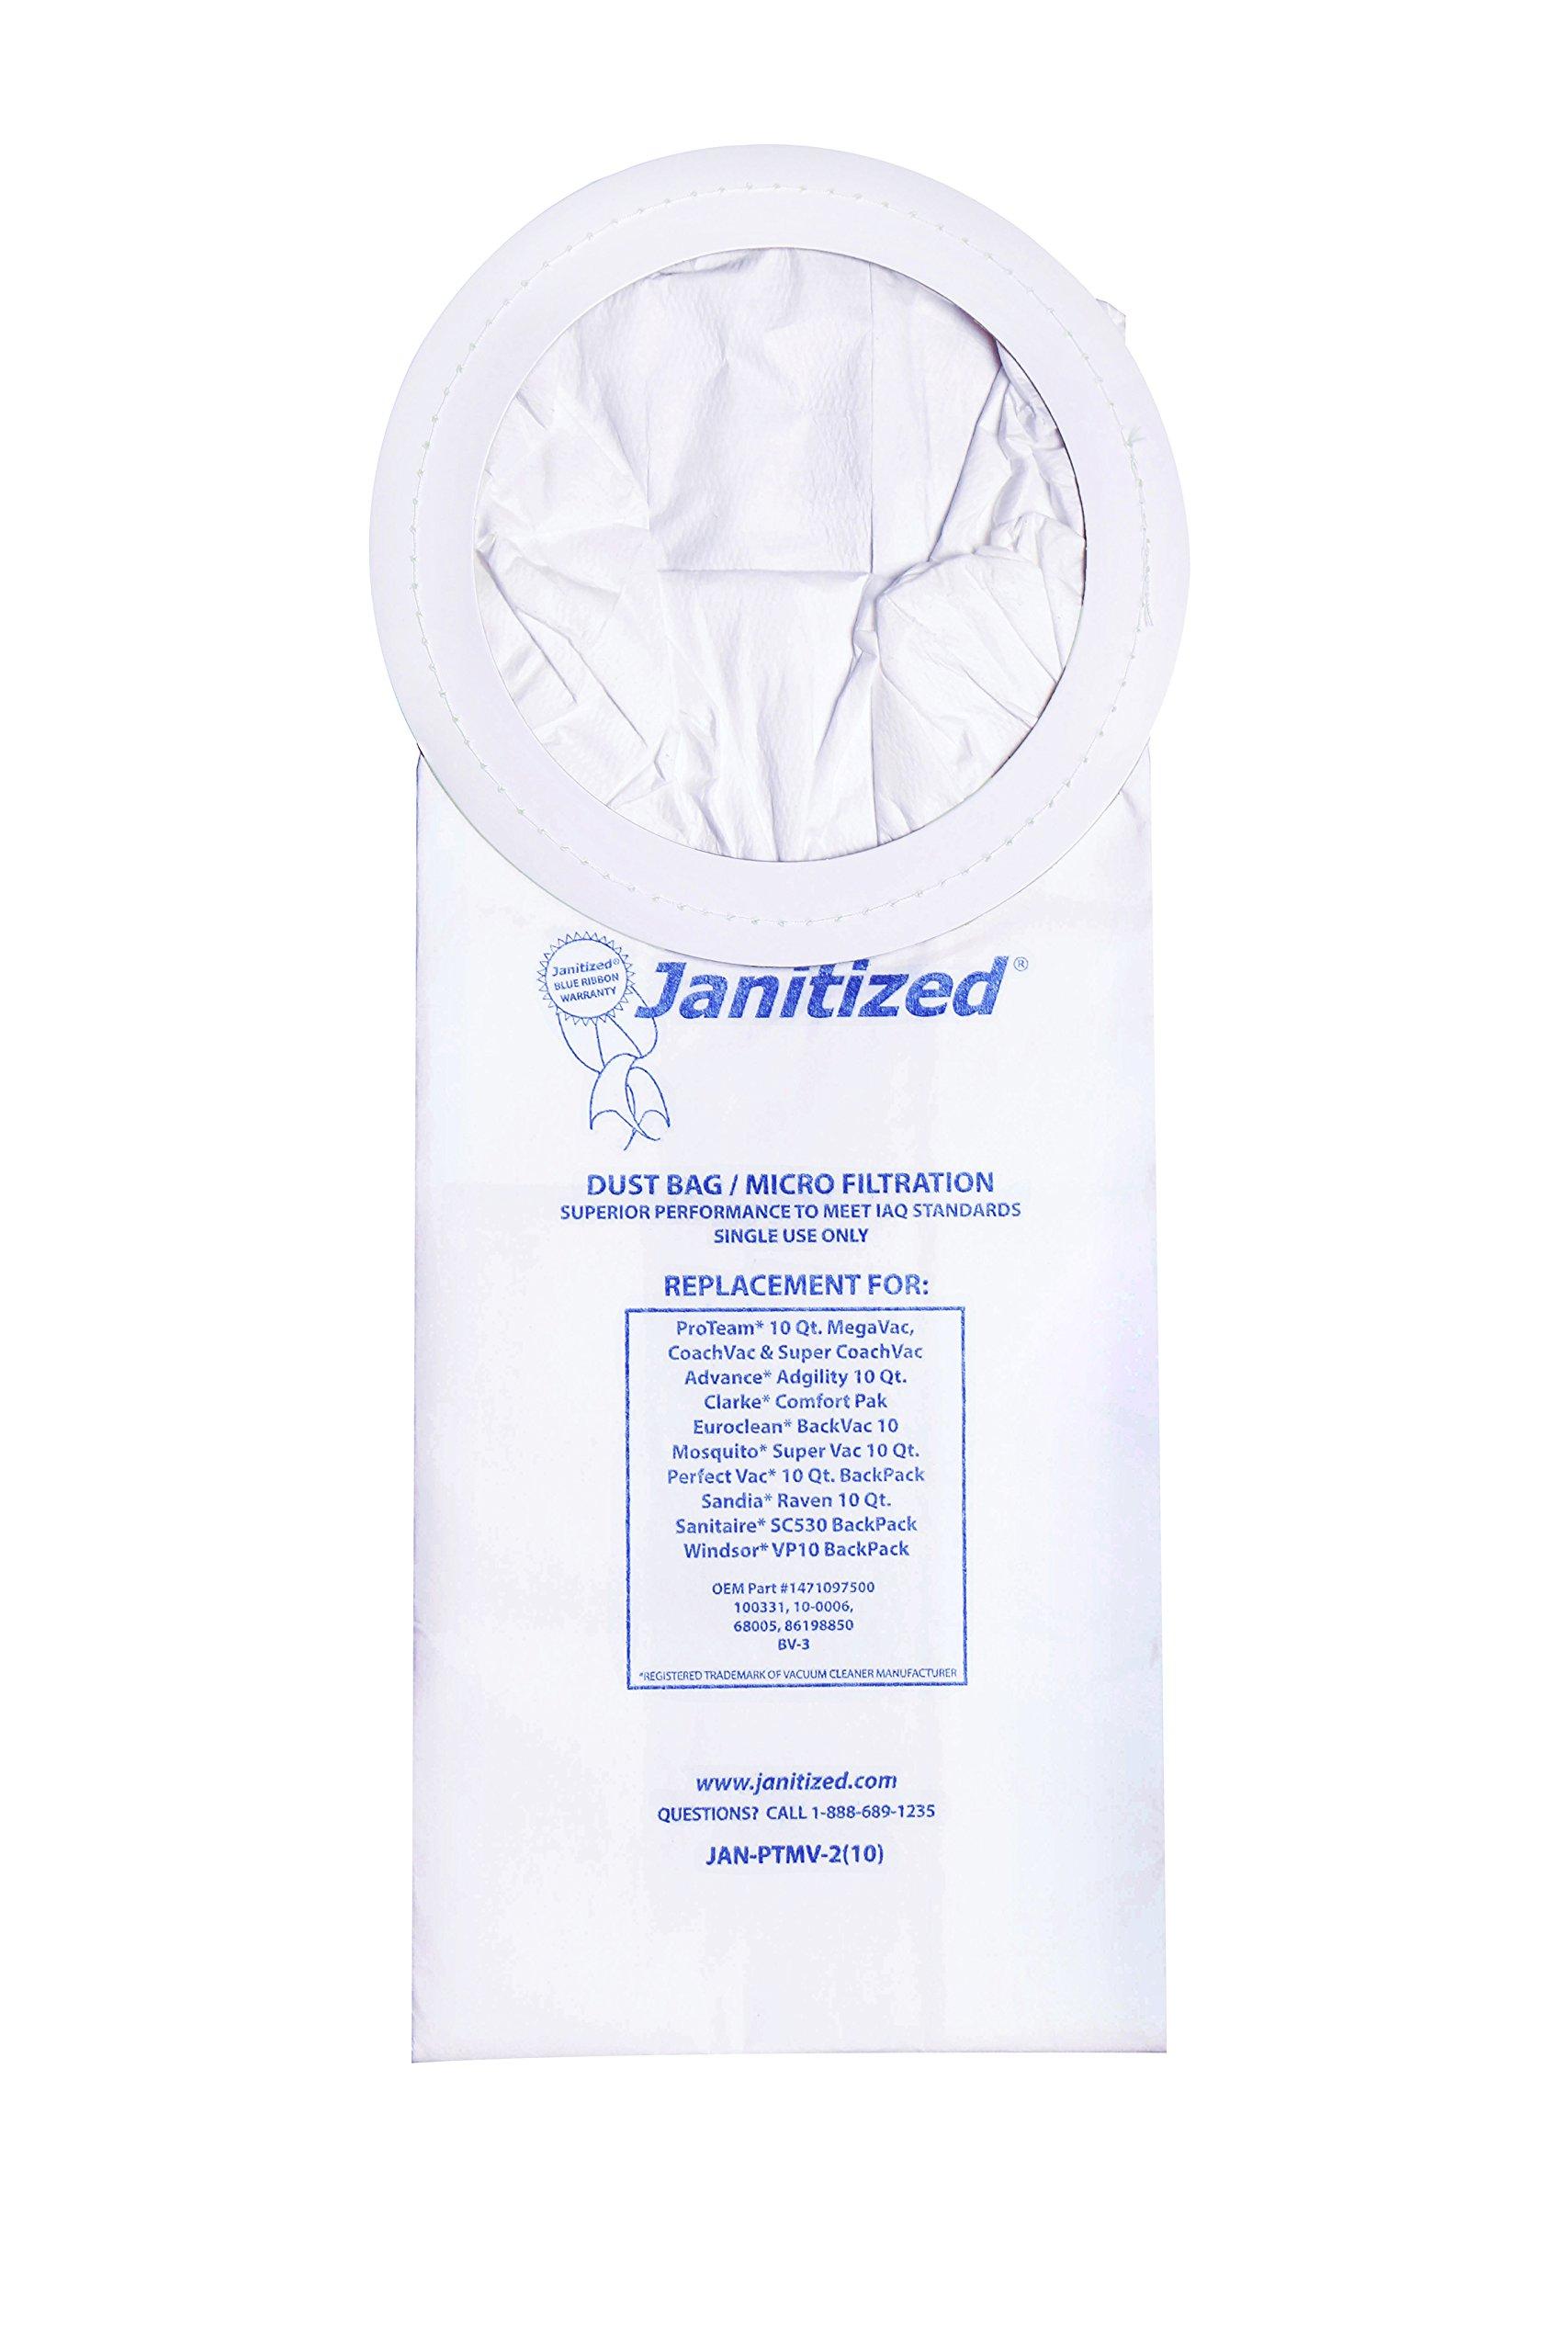 Janitized JAN-PTMV-2(10) Premium Replacement VacBag:ProTeam SuperCoach,Mosquito,Advance Adgility,Sandia Raven 10qt,Sanitaire SC530 OEM#1471097500,62135,100331,10-0006(10 count)